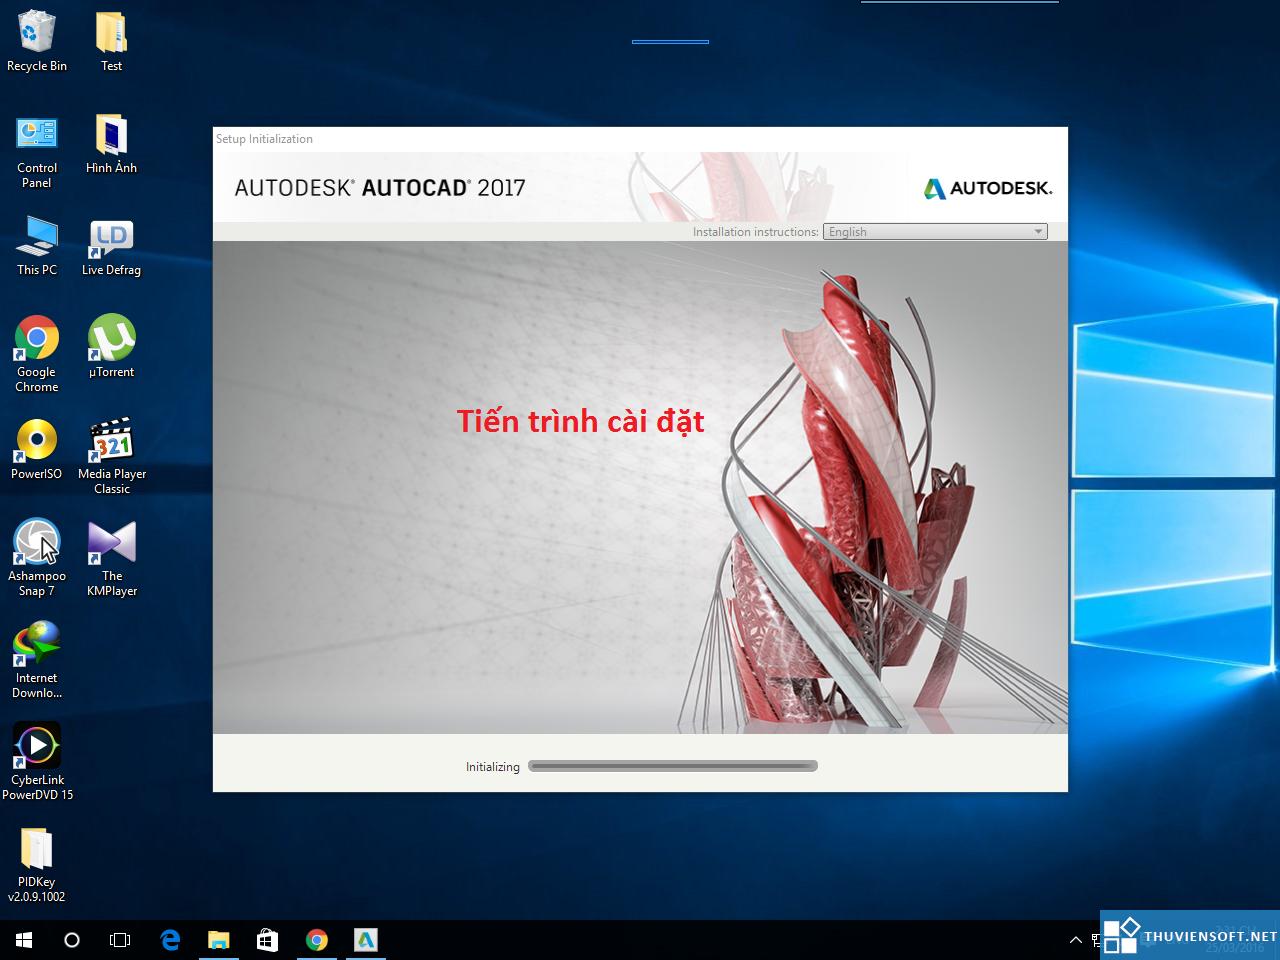 Autodesk AutoCAD 2017 Full, Link GDrive